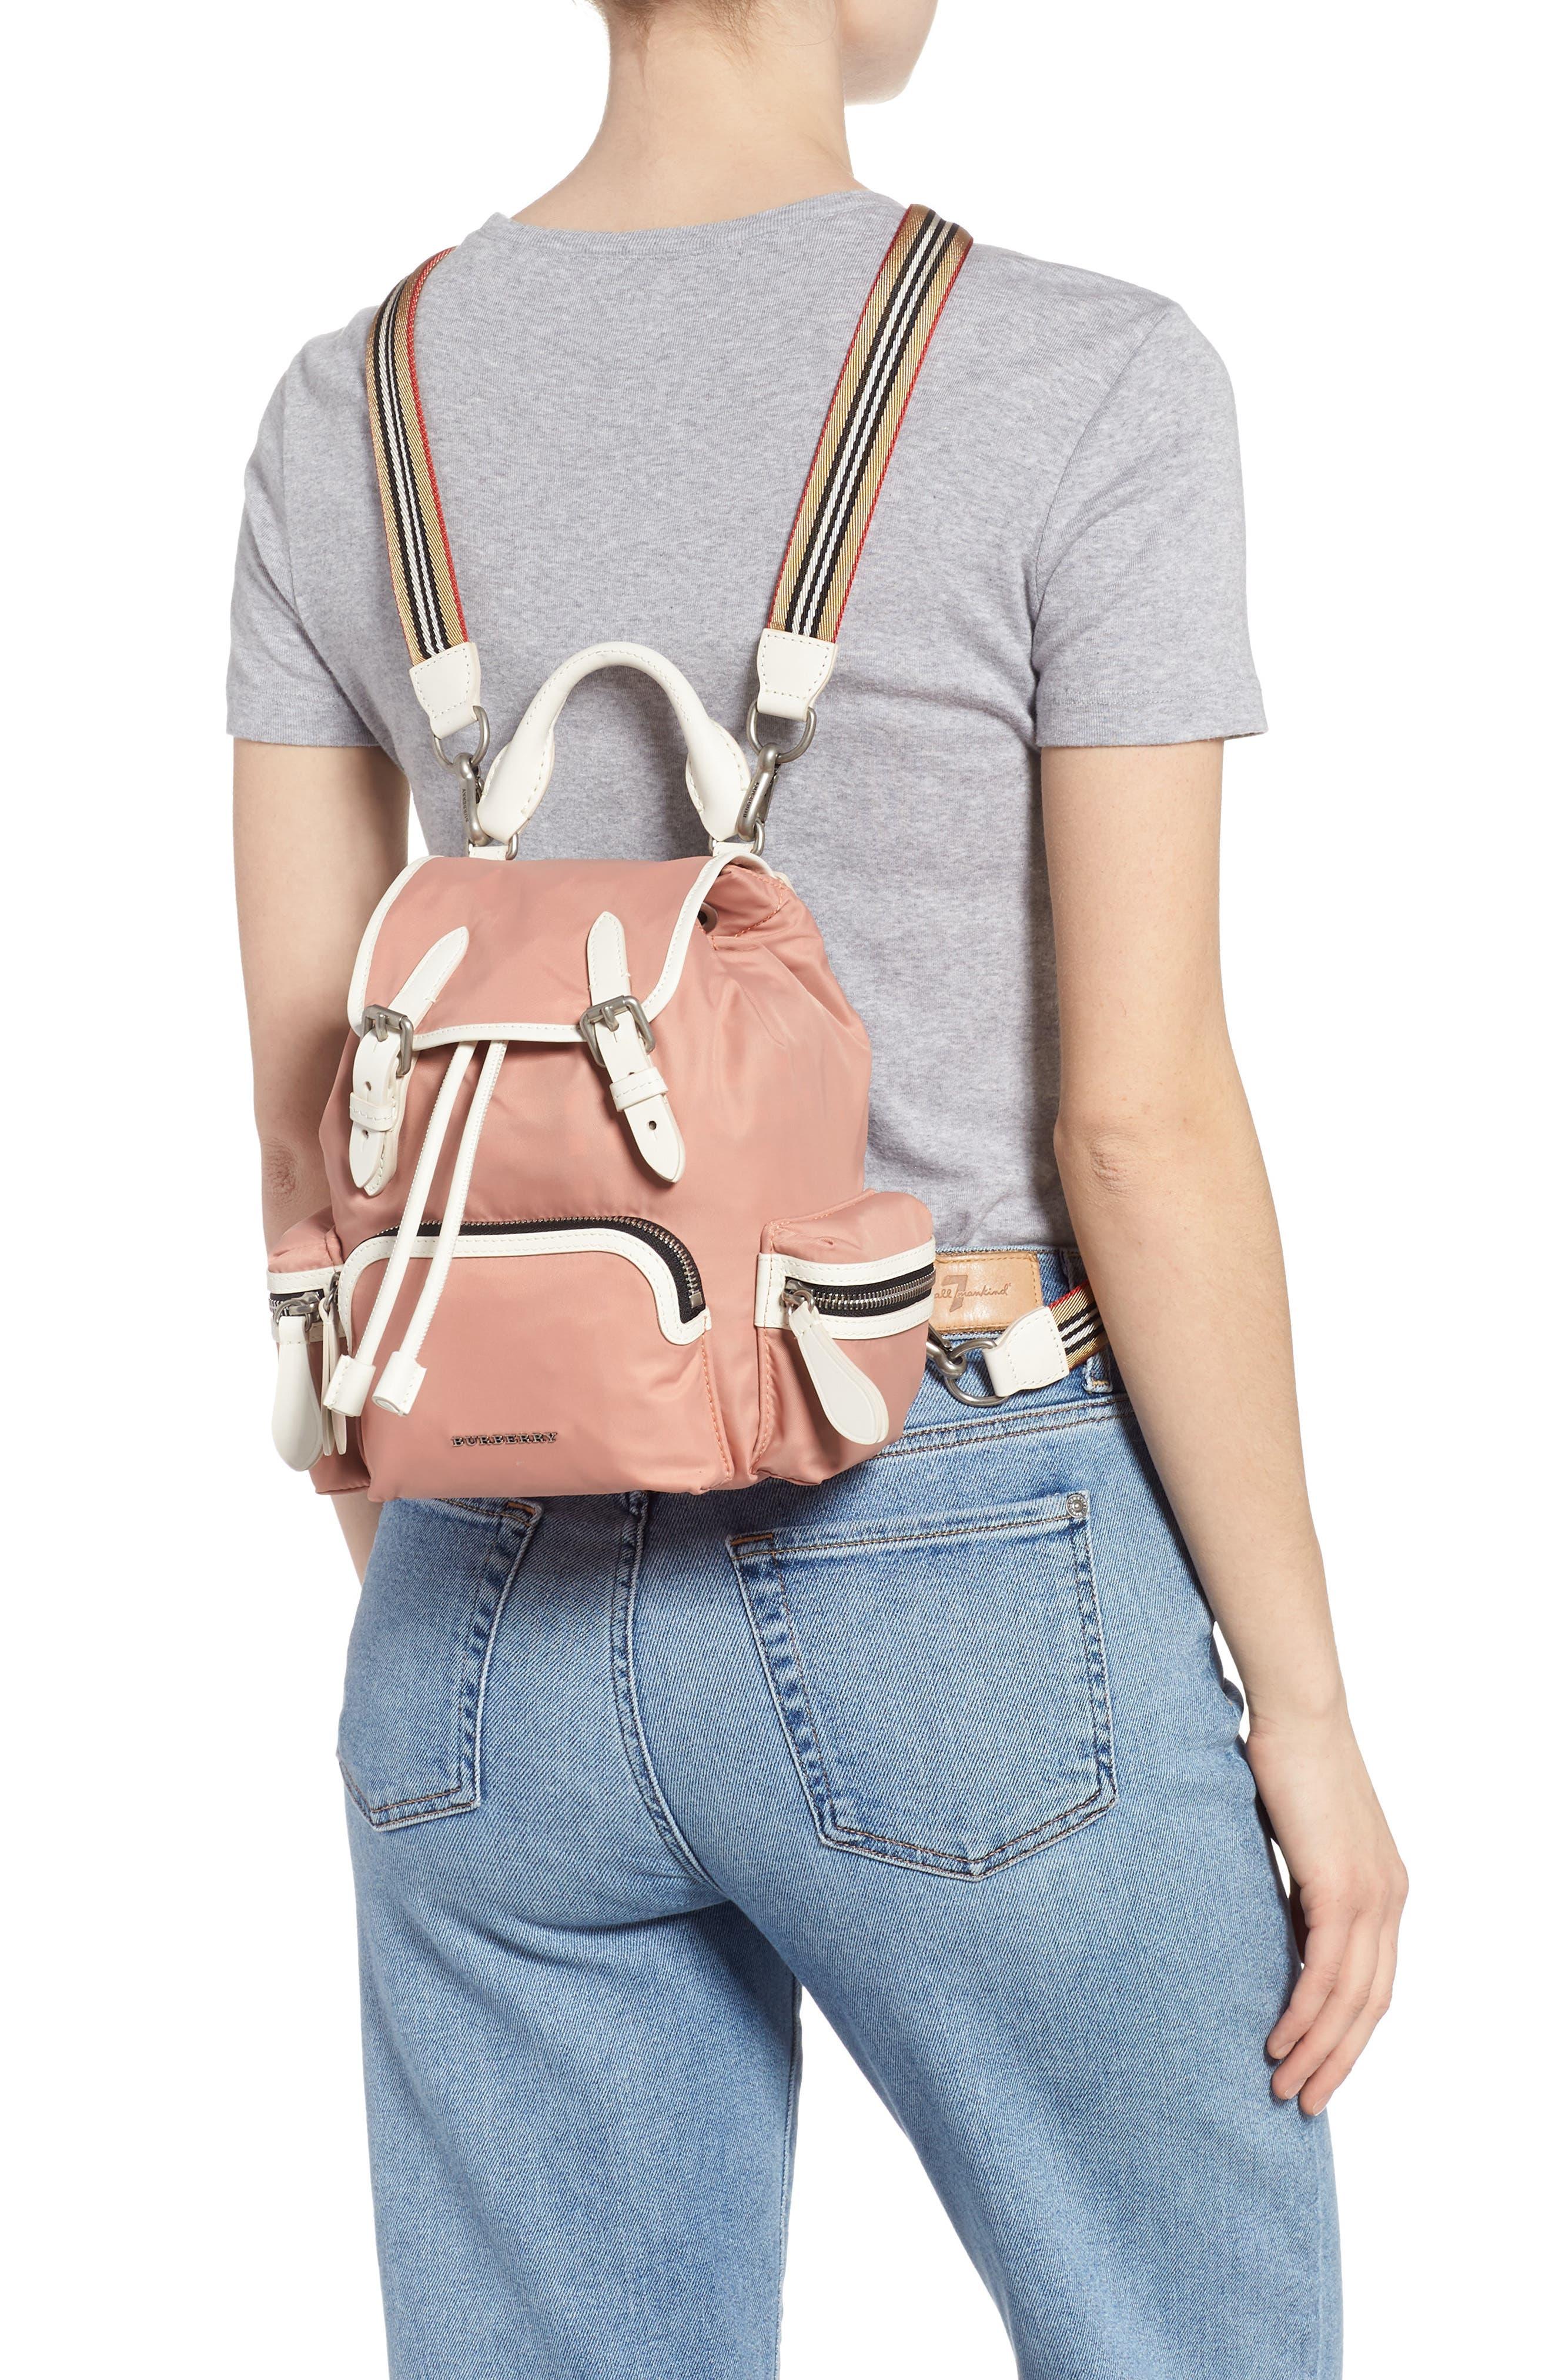 Small Rucksack Nylon Backpack,                             Alternate thumbnail 2, color,                             POWDER PINK